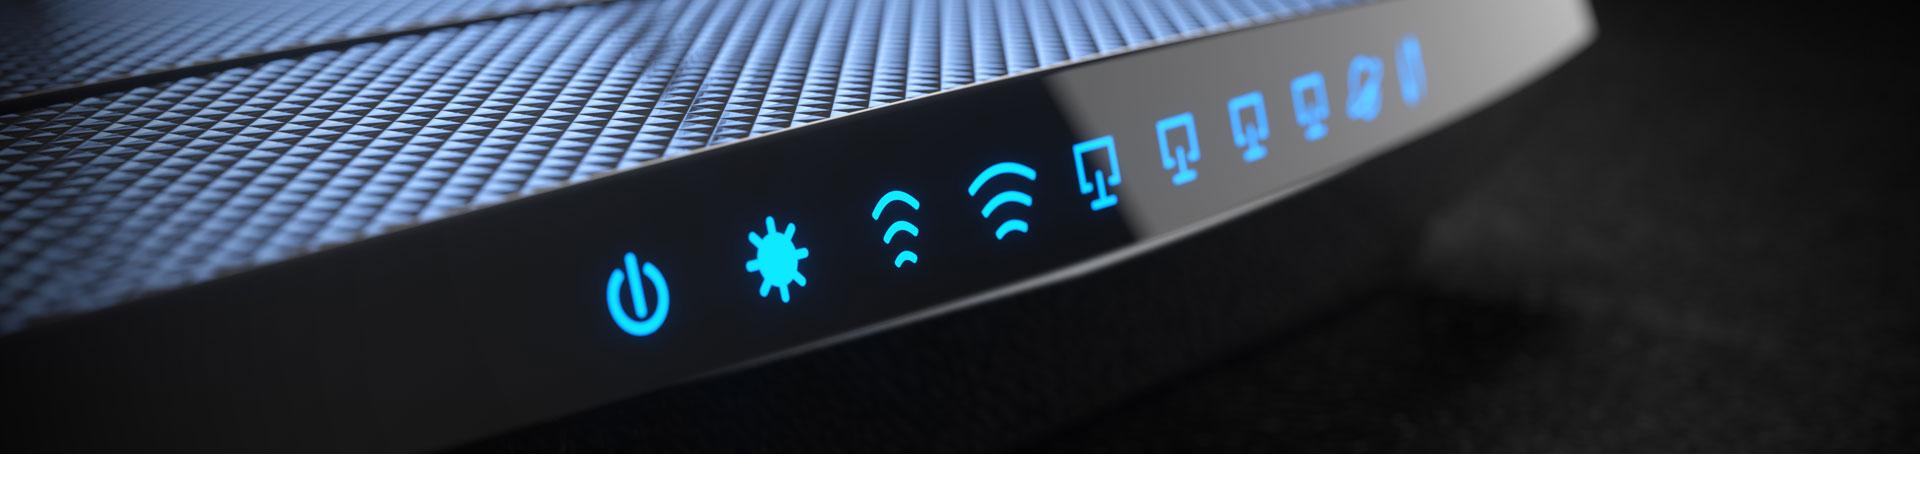 Promwad Telecom